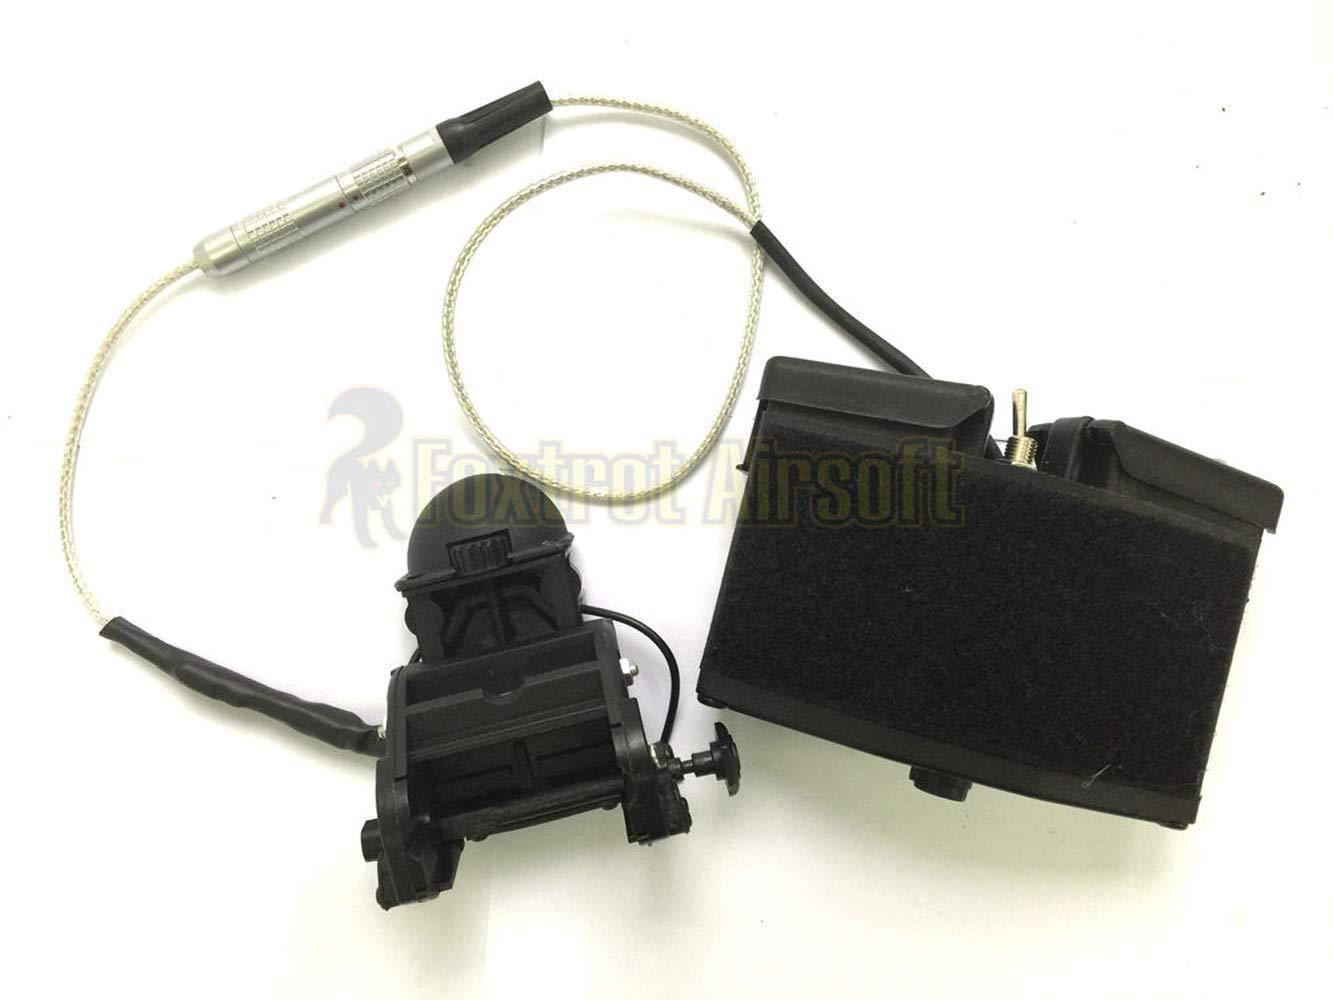 TN Dummy ANVIS 6 9 Helmet Mount w/Battery Box Kit For mich fast ODA Cag pj sfod